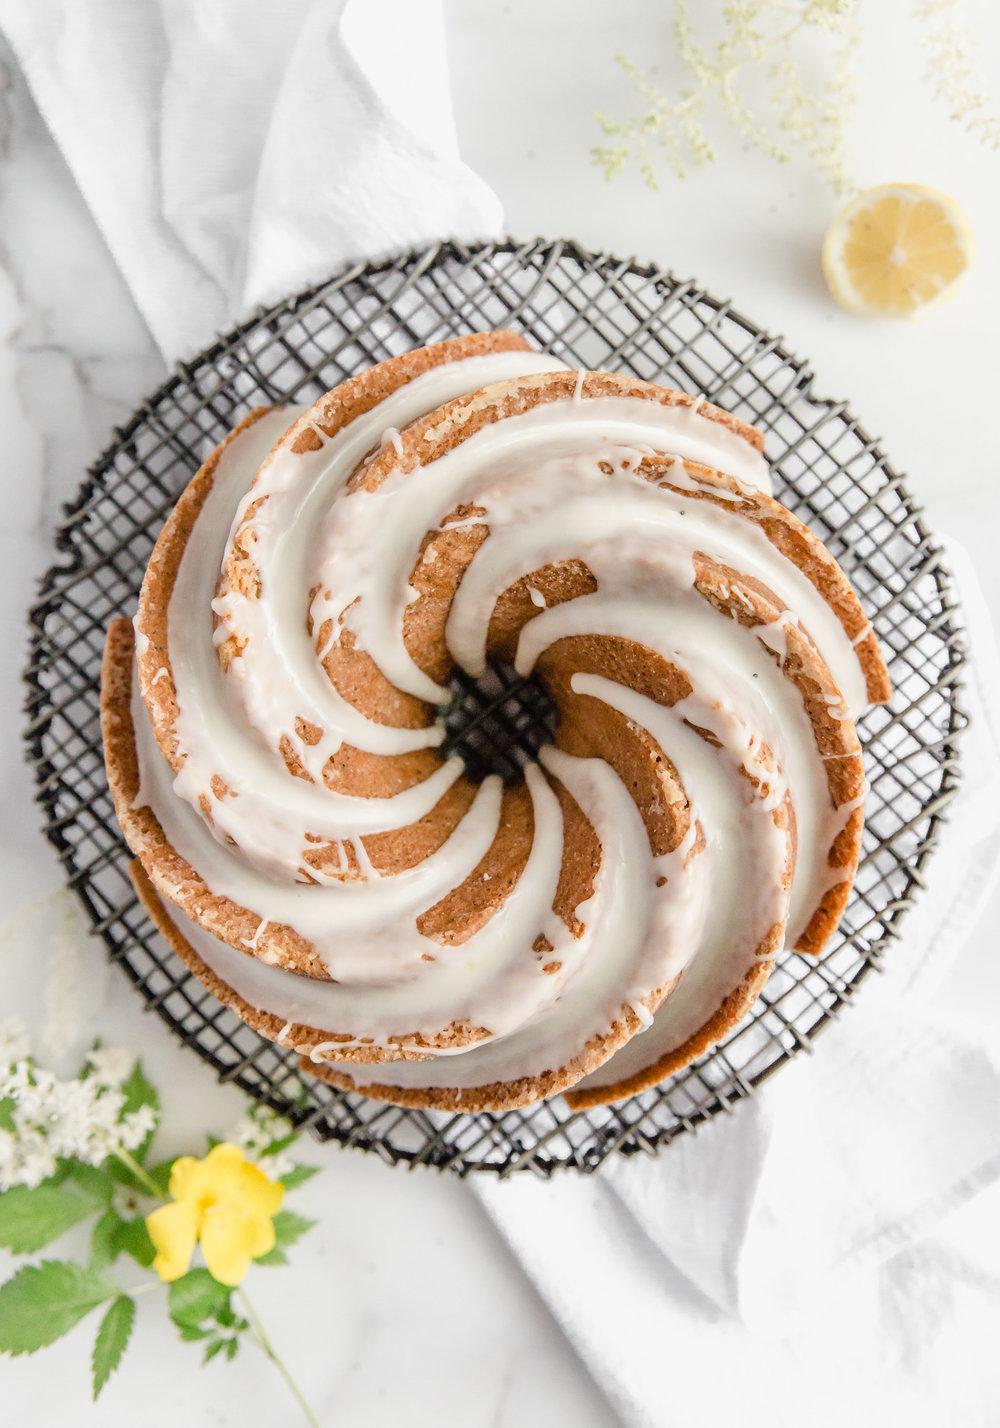 lemon-poppy-seed-bundt-cake-with-lemon-glaze-1.jpg